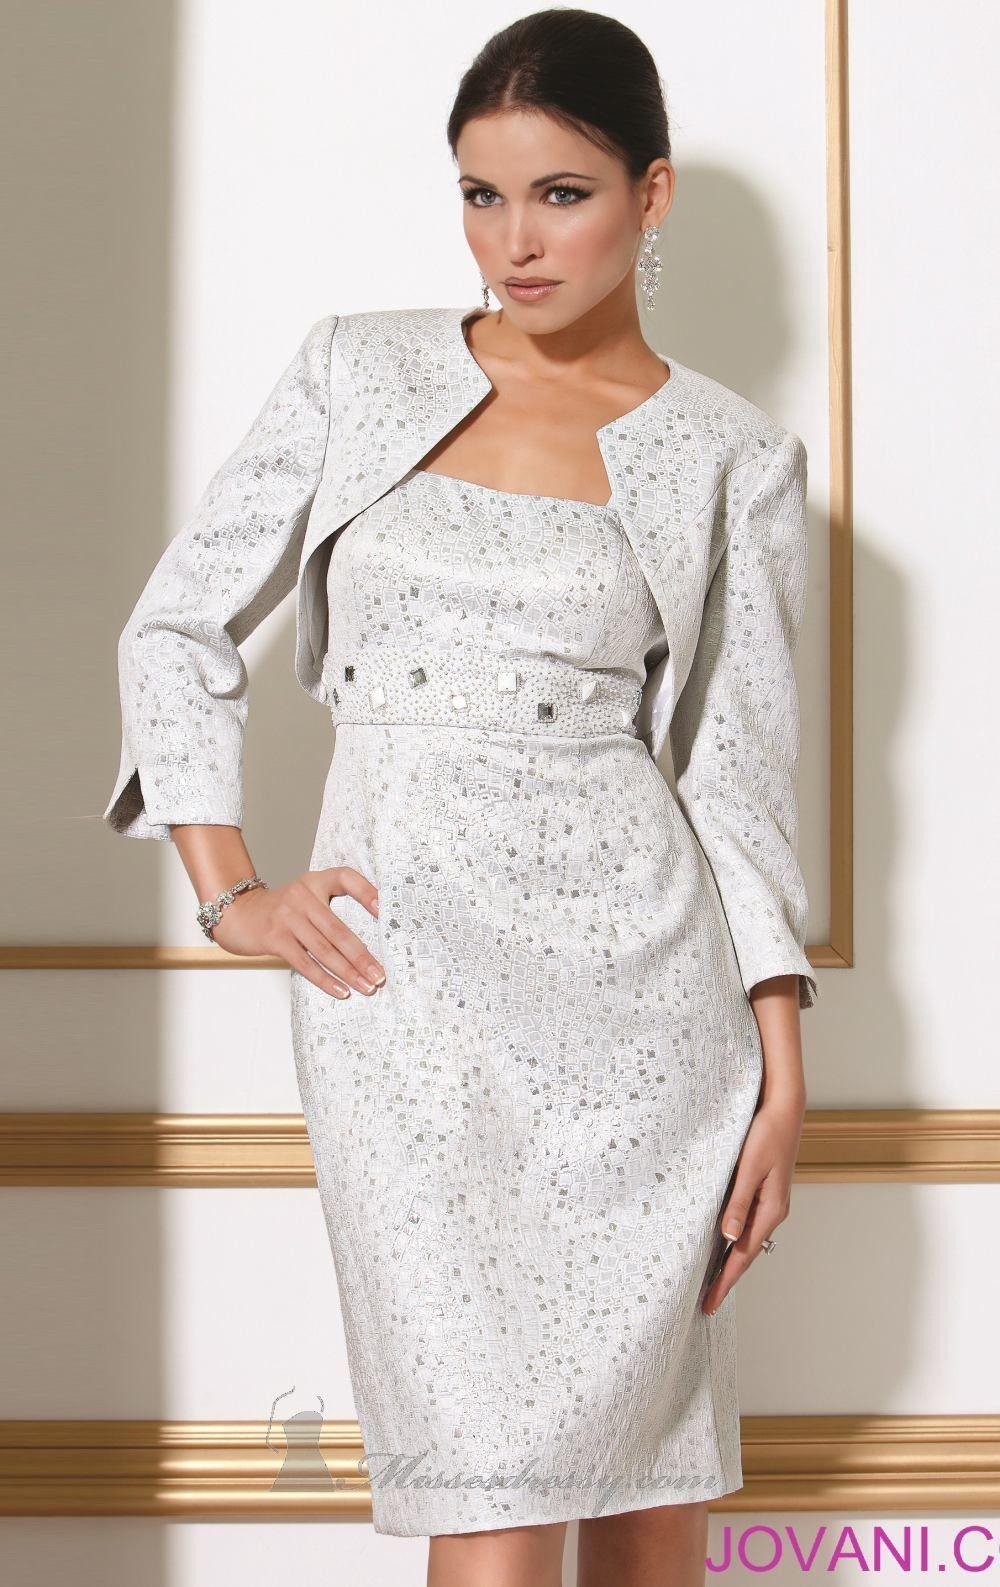 Jovani dress missesdressy samus big day ideas pinterest